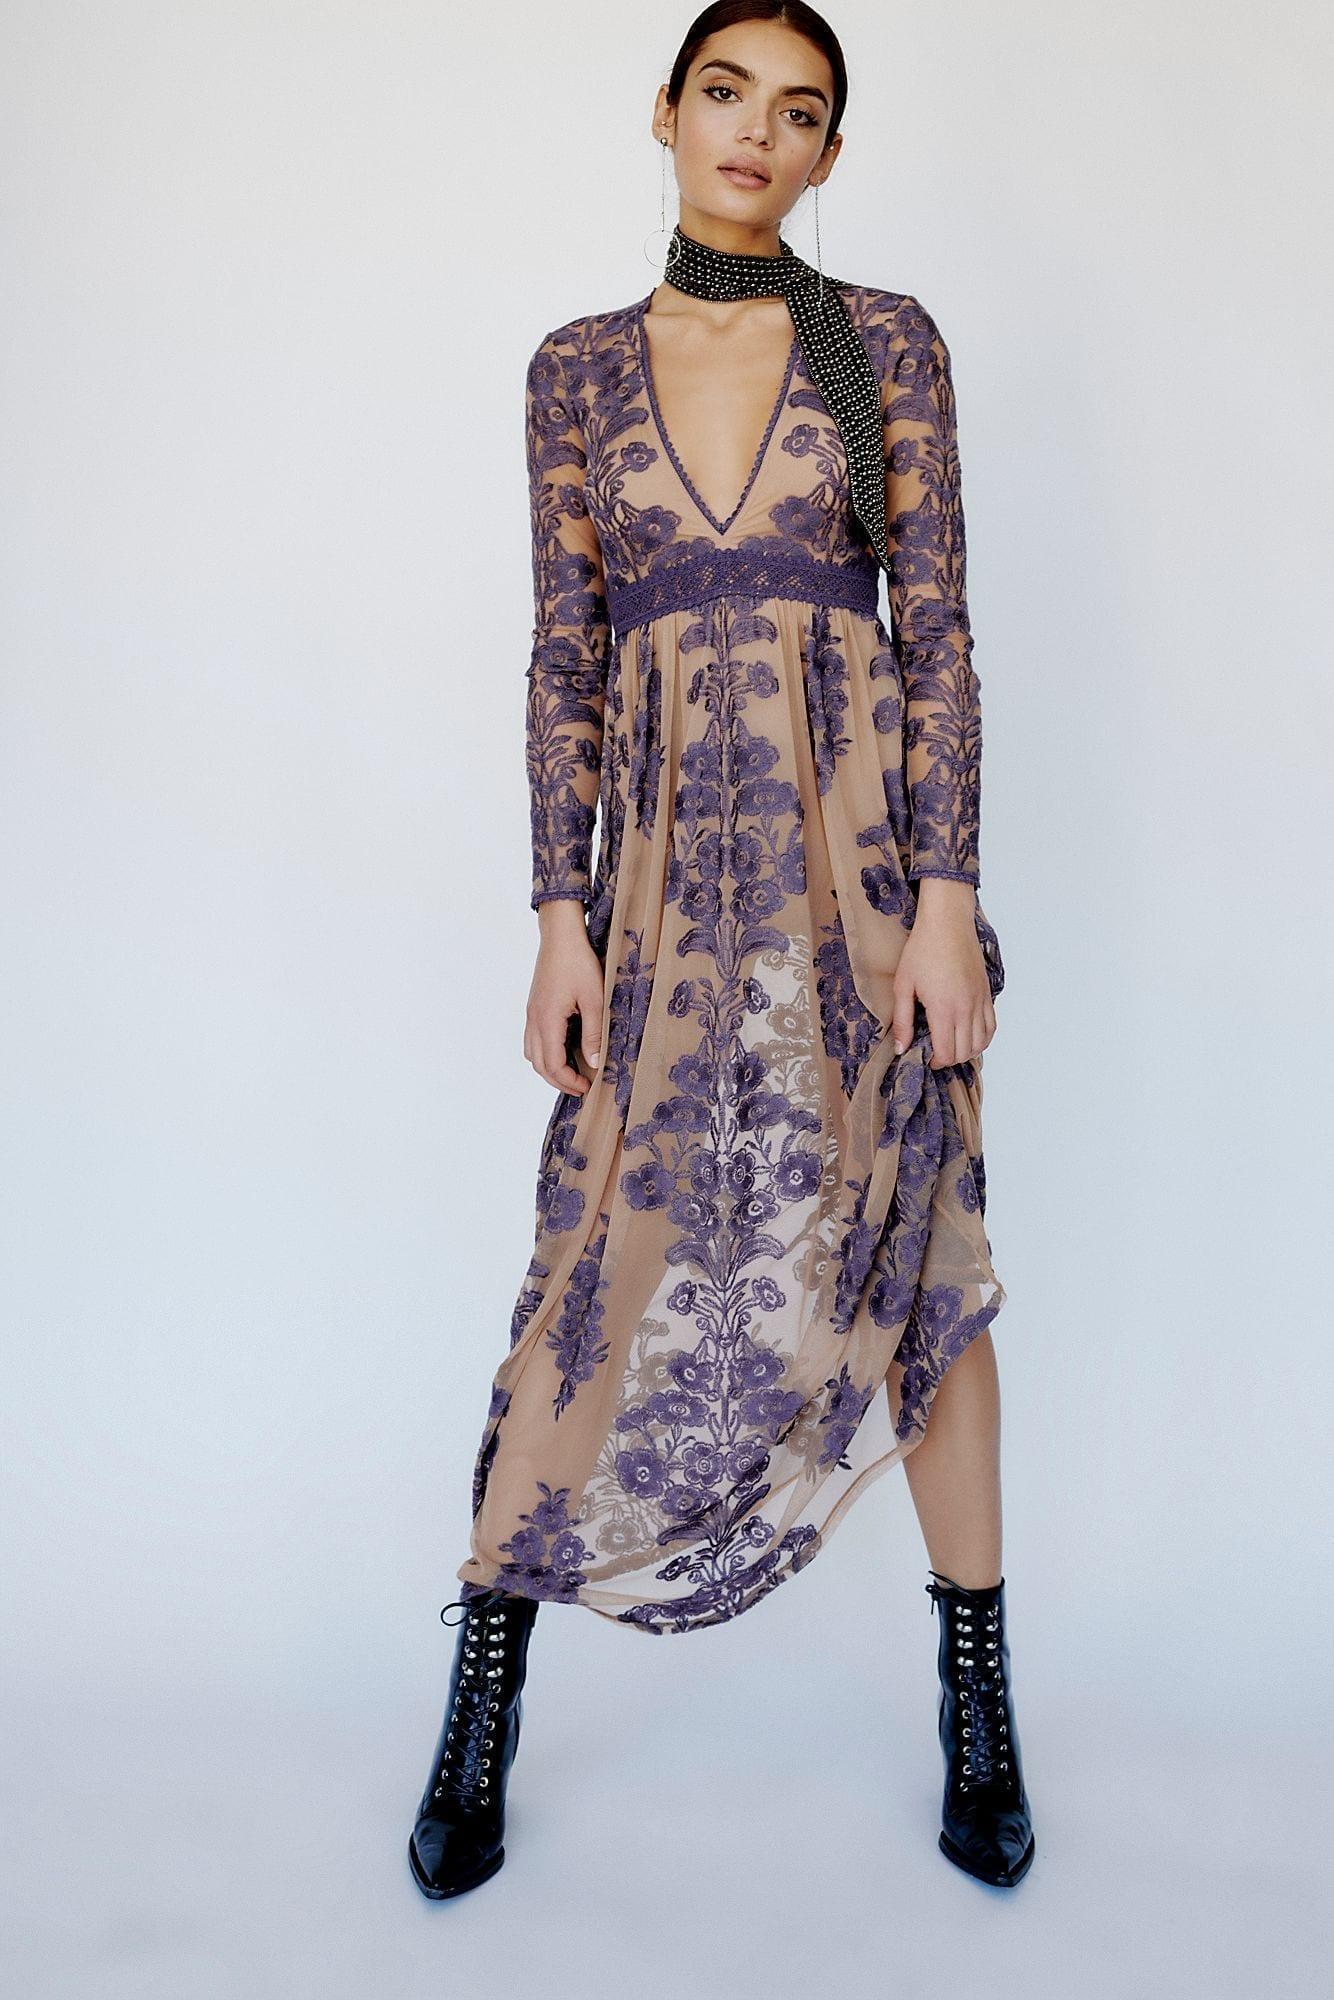 FREEPEOPLE Temecula Maxi Eggplant Dress